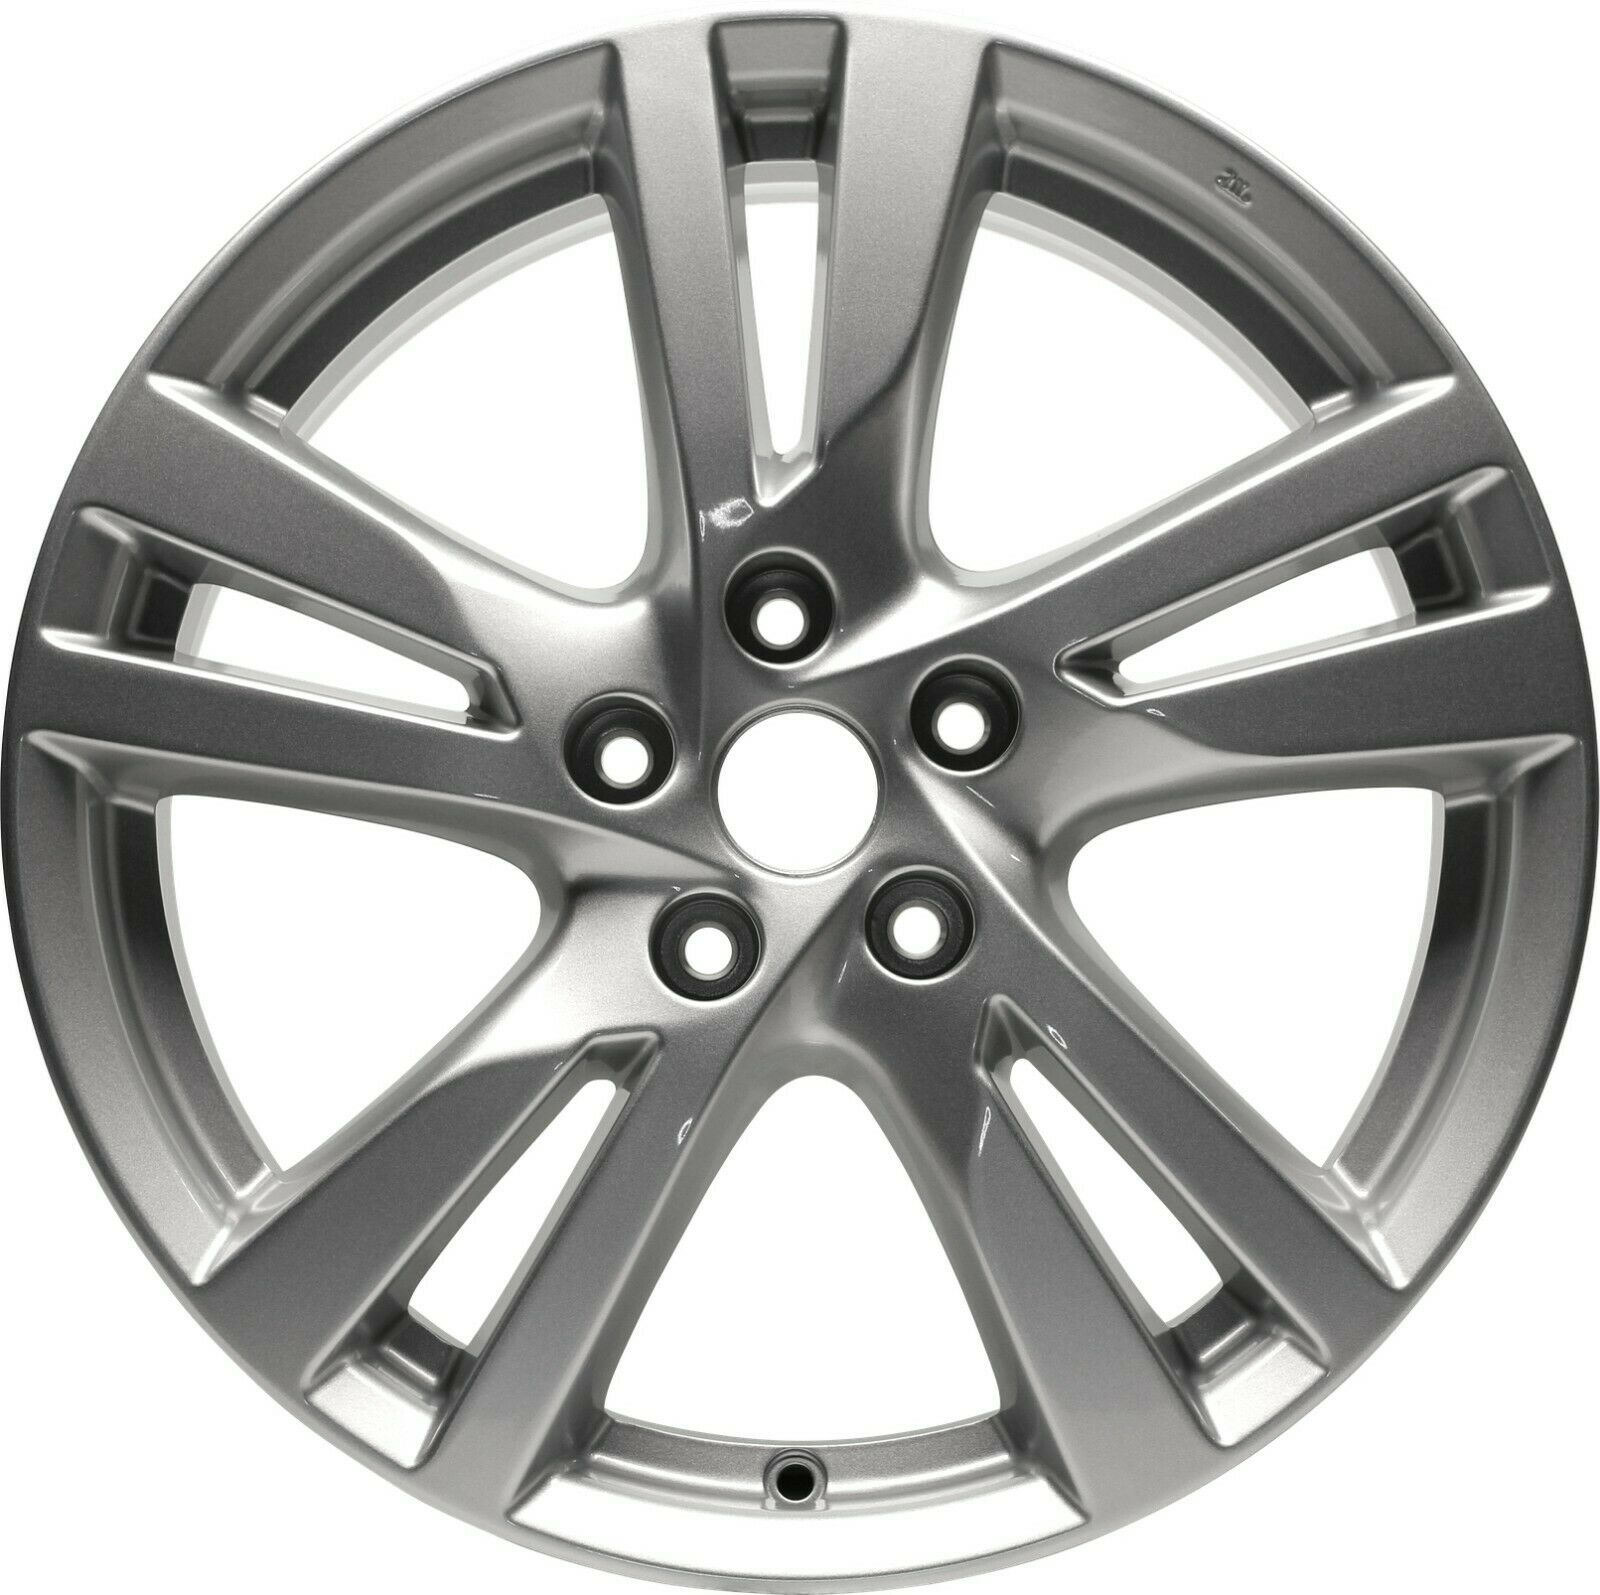 Aluminum Alloy Wheel Rim 18 Inch Fits 2013-2017 Nissan